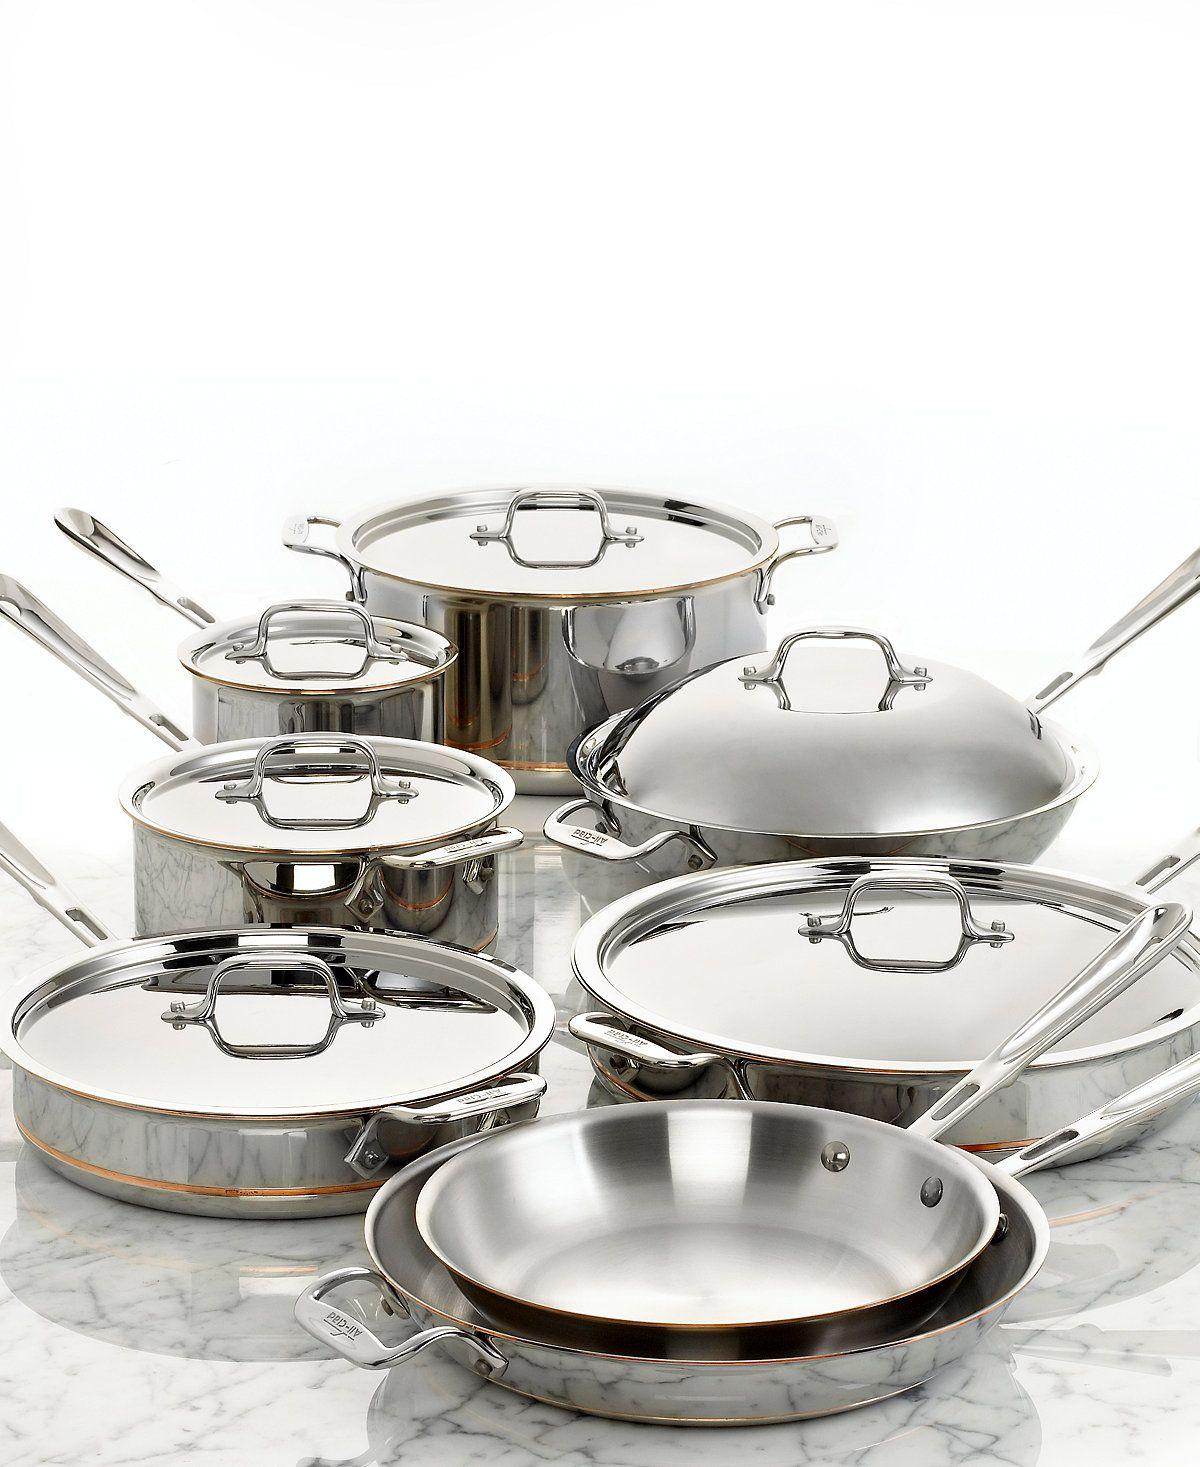 Allclad coppercore 14pc cookware set cookware